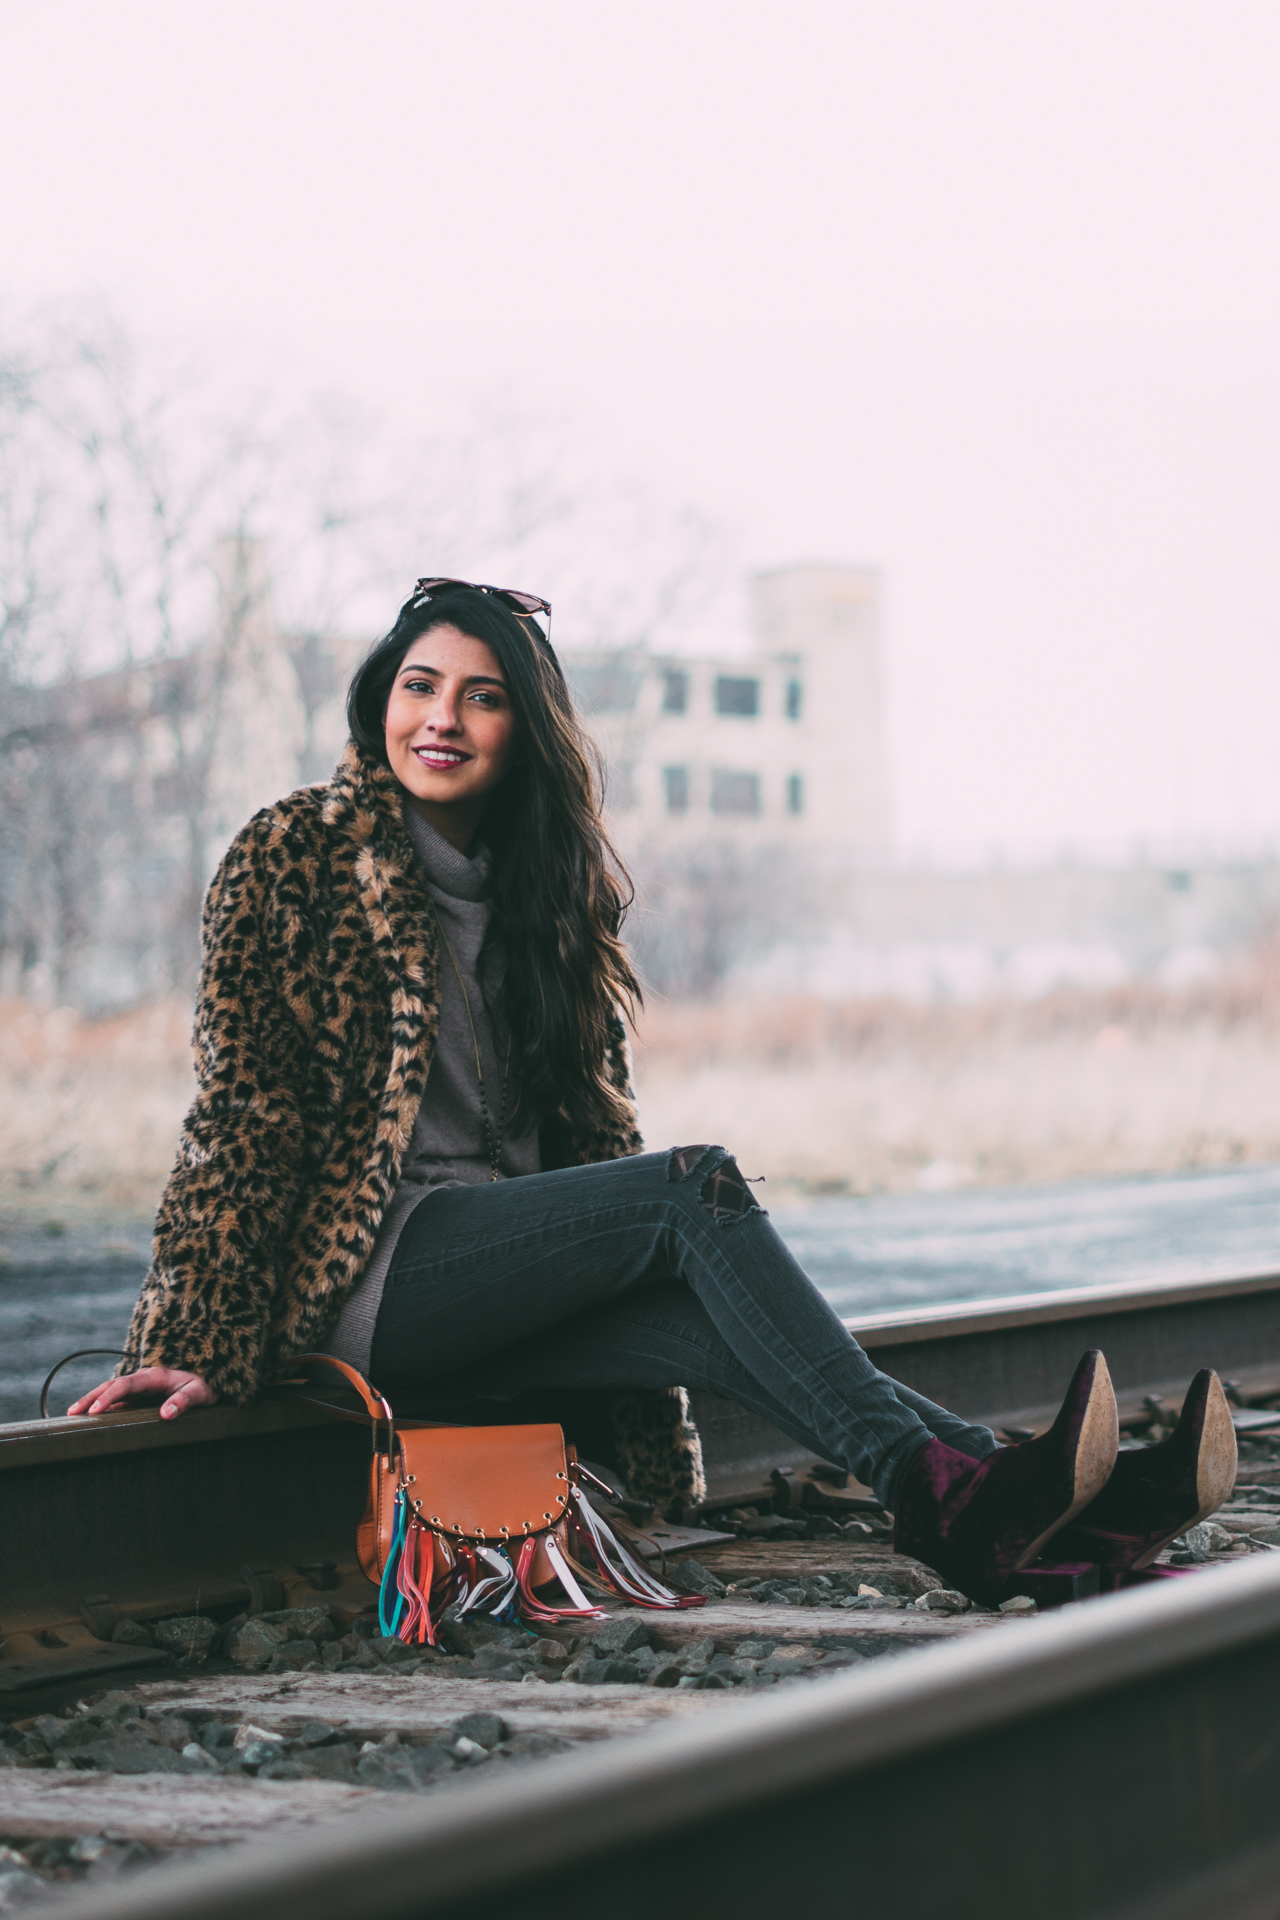 leopard-faux-fur-coat-velvet-boots-winter-style-blogger-outfit-layers-street 6